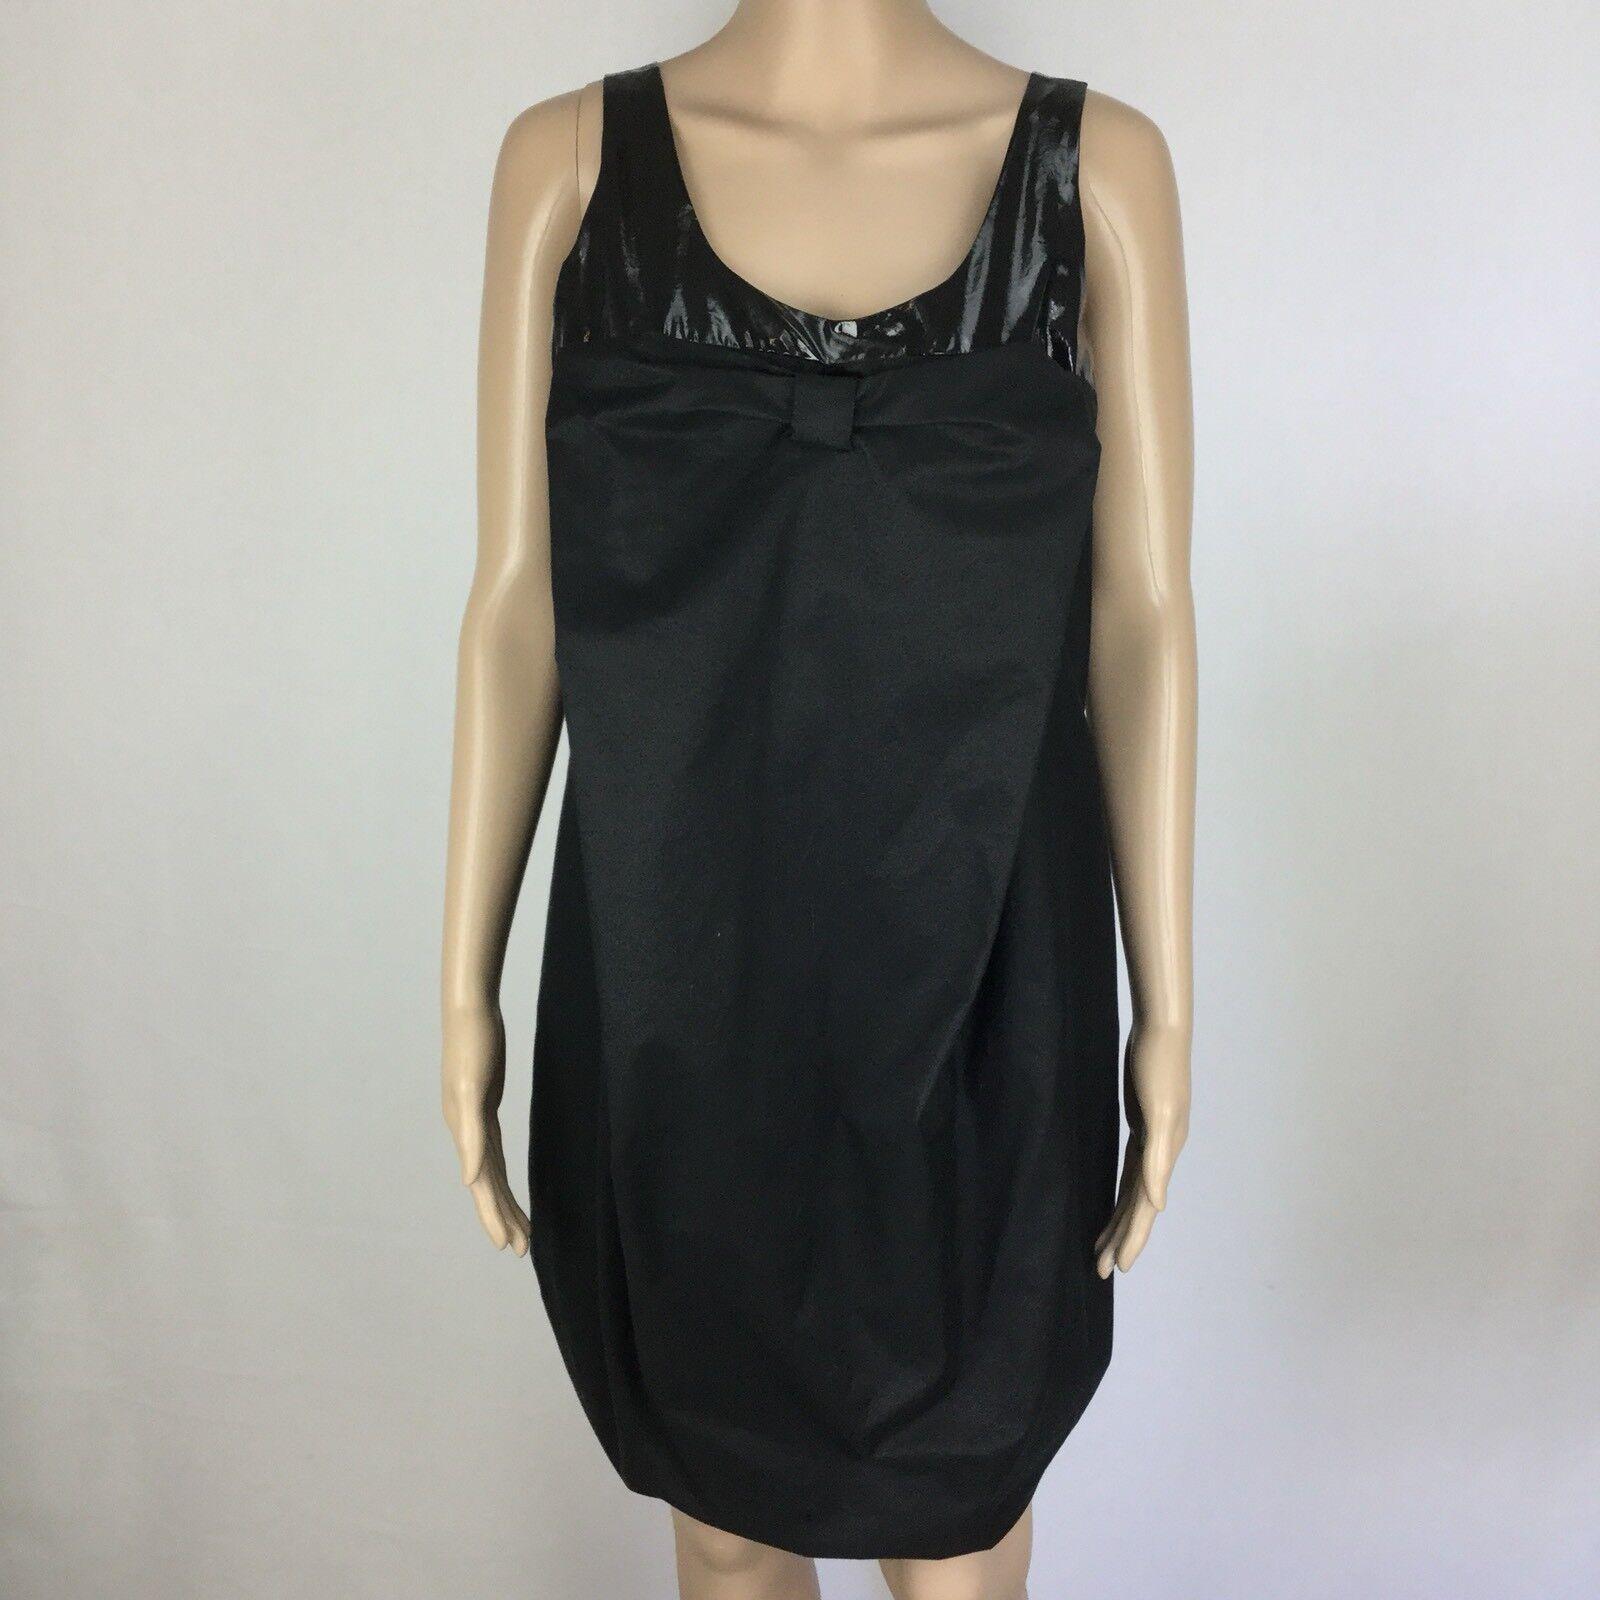 Marlene Birger's Darling Deirdree schwarz Pockets Bubble Dress Größe 36   10 (BV12)